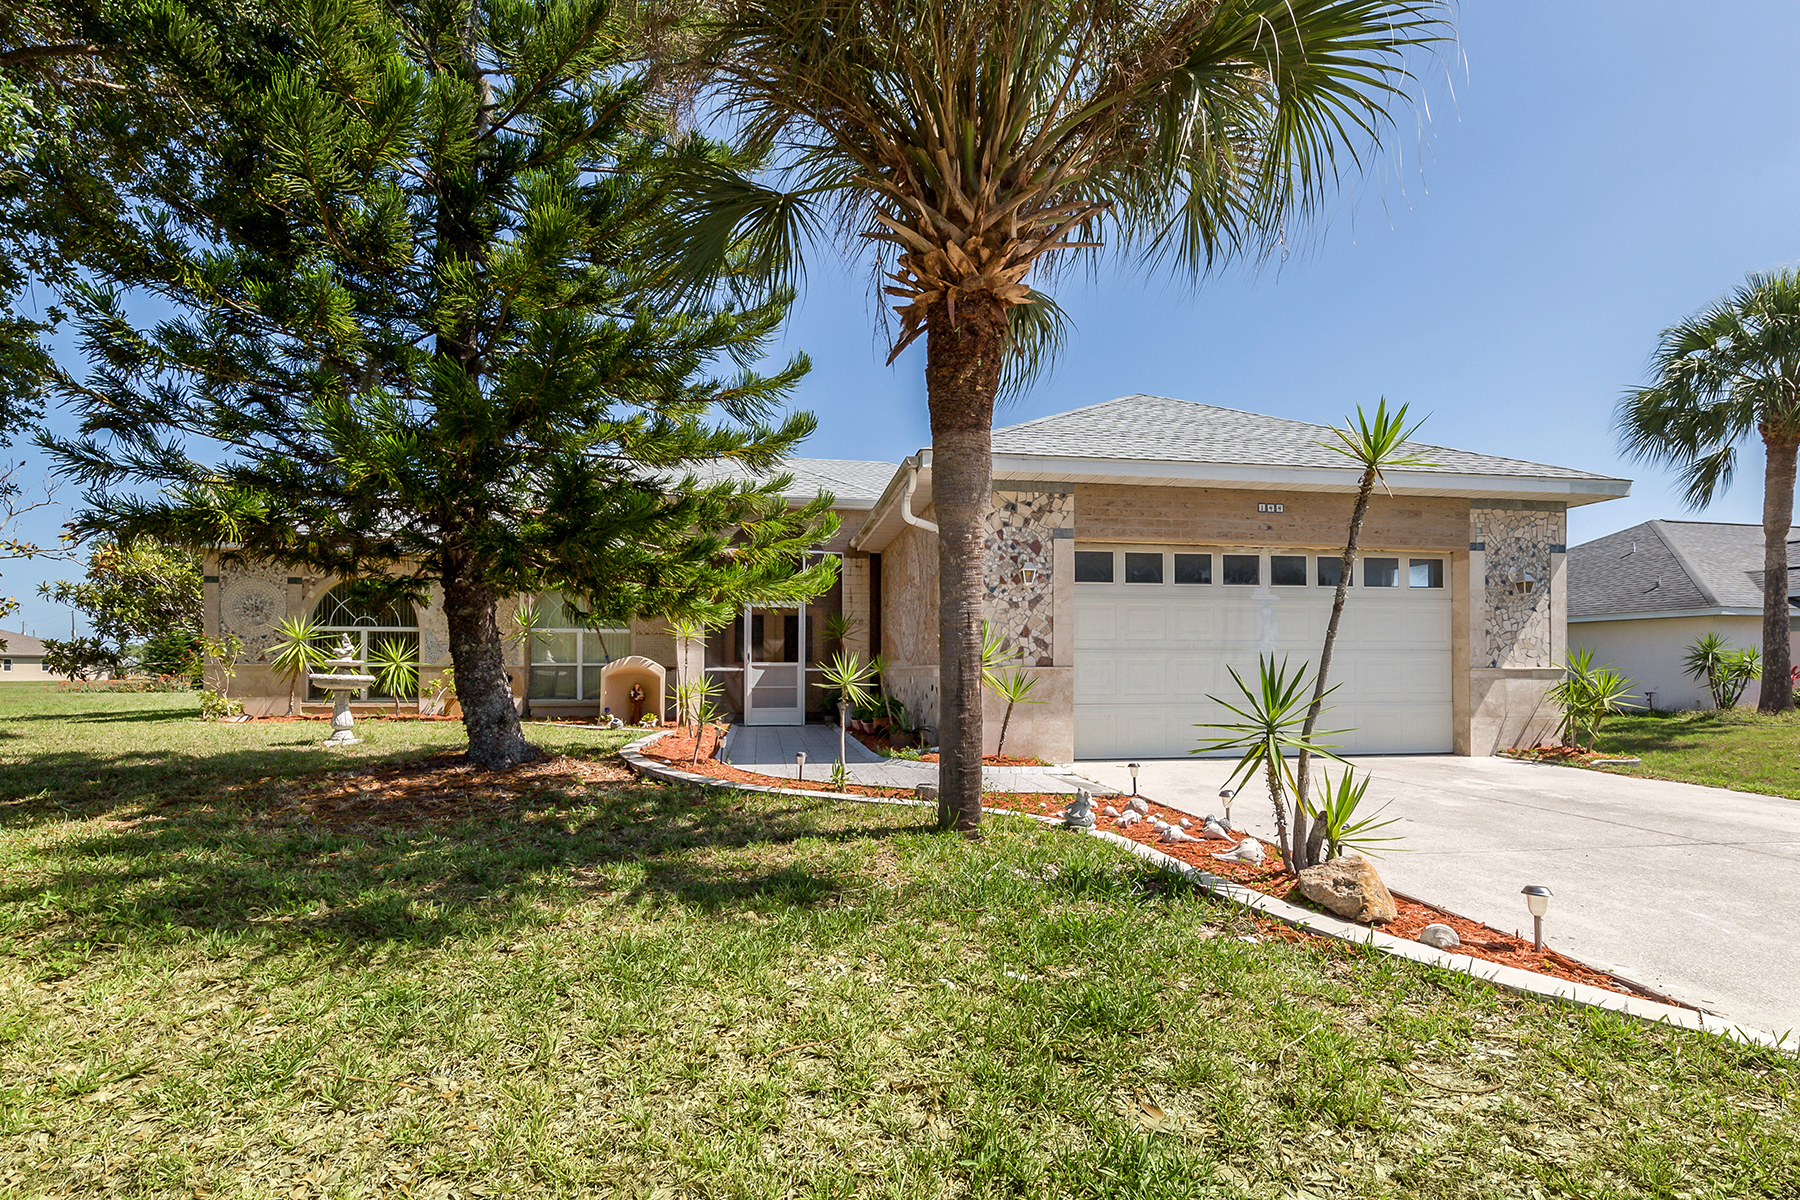 Single Family Homes for Active at ROTONDA WEST 144 Mariner Ln Rotonda West, Florida 33947 United States